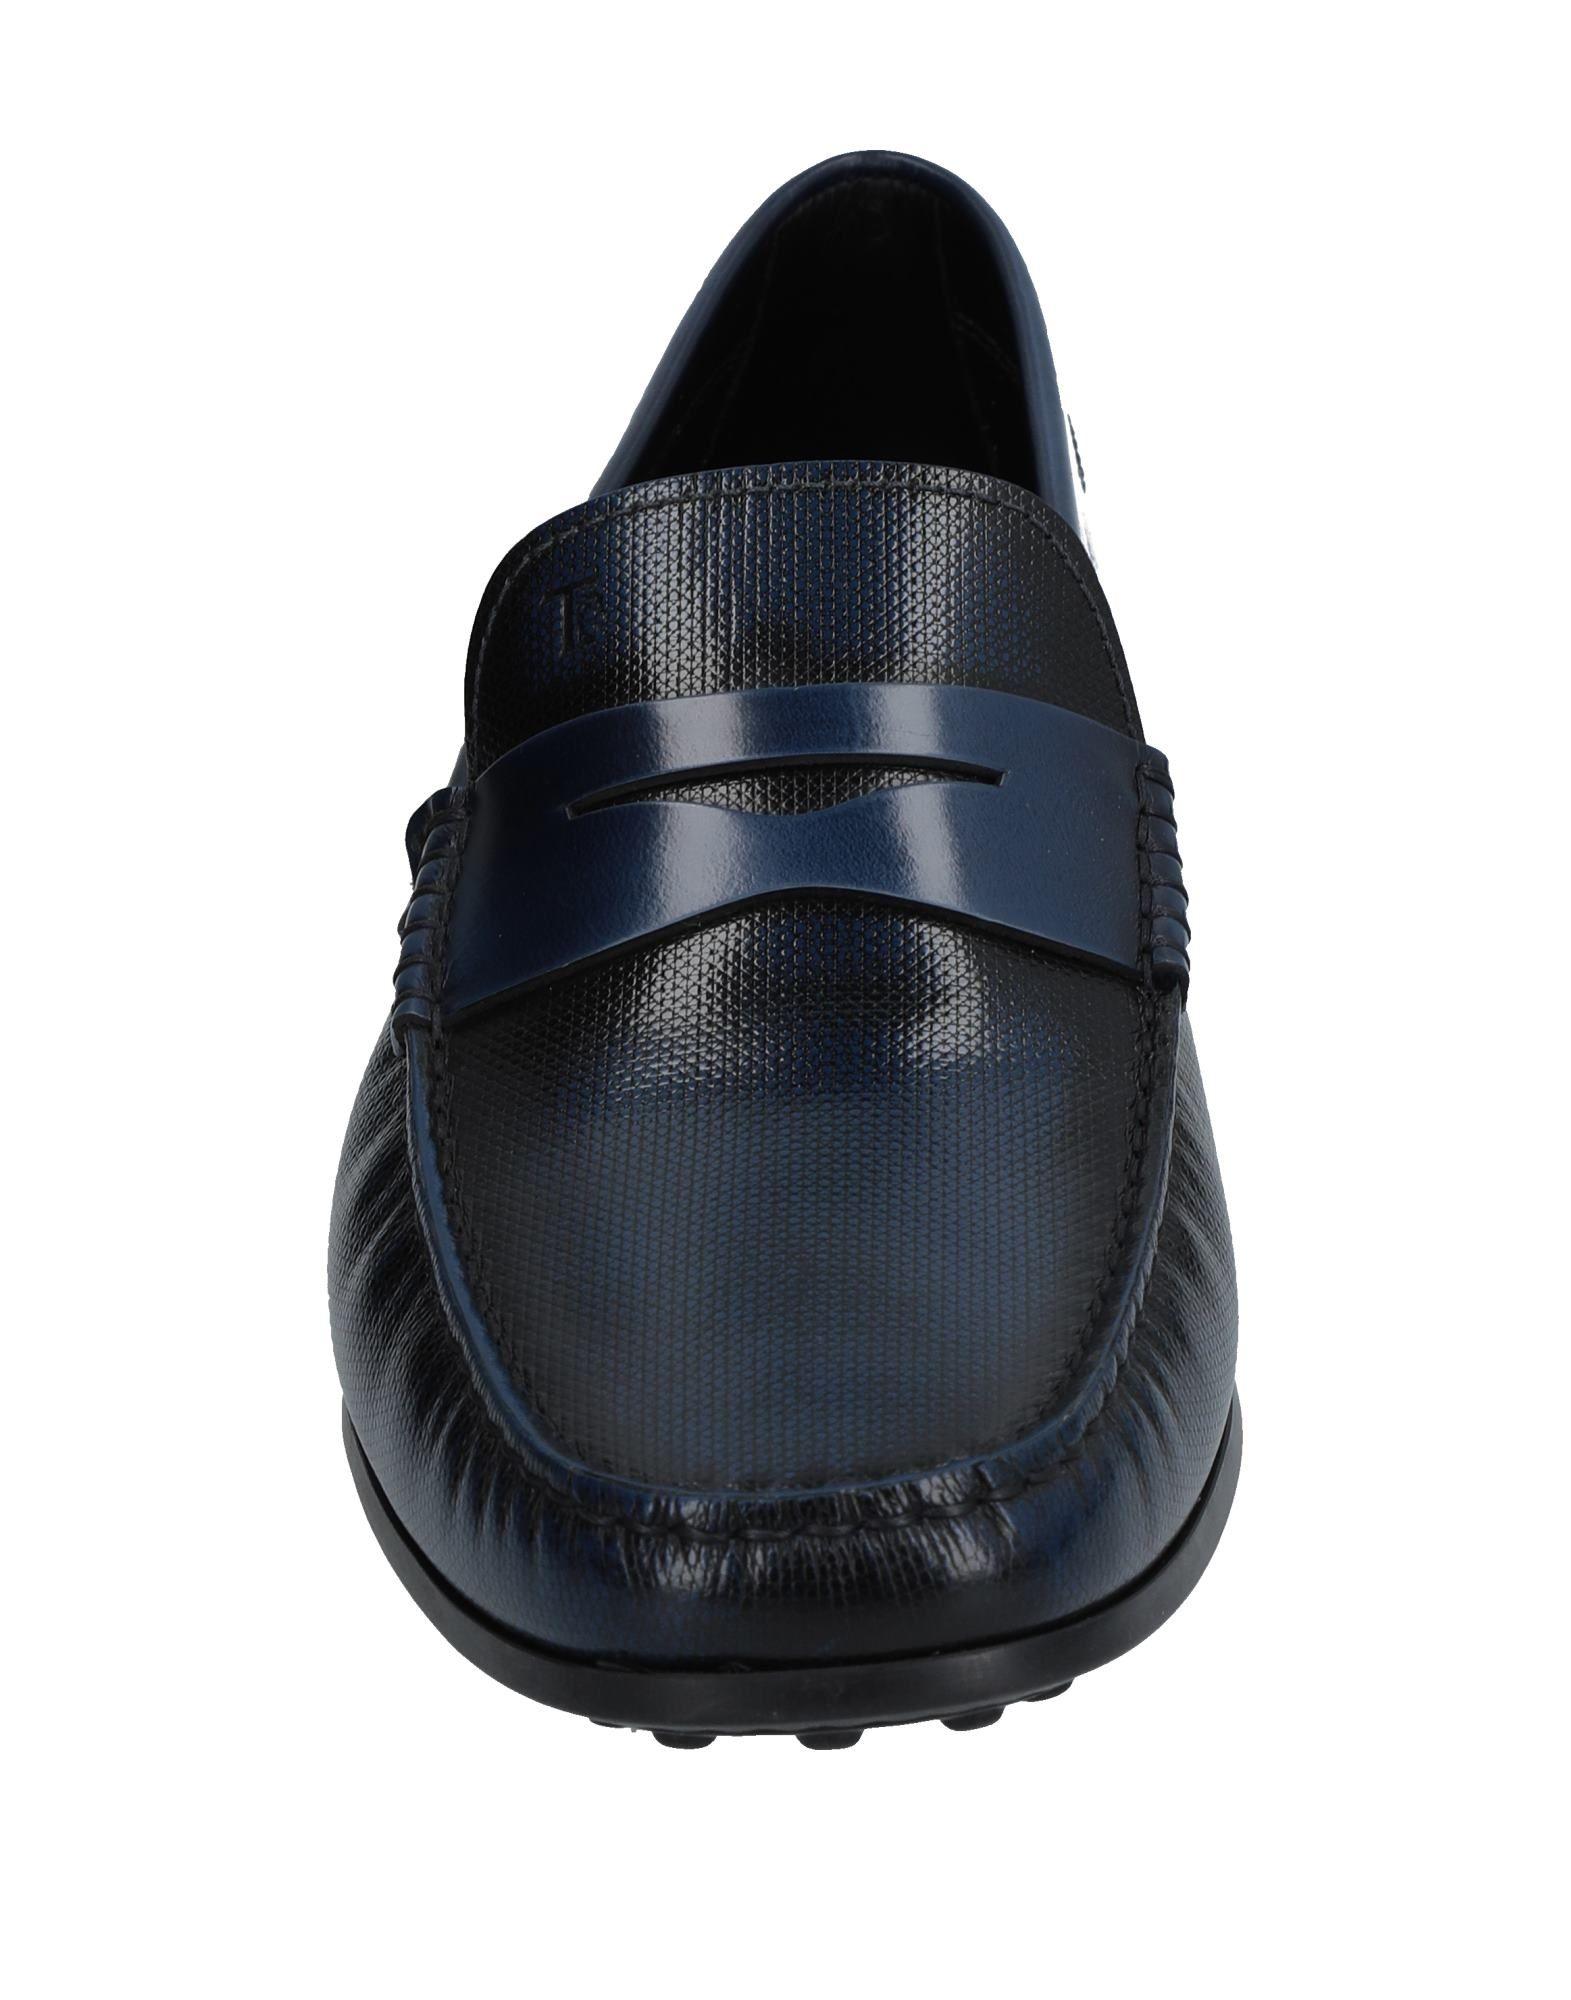 Tod's Mokassins Herren beliebte  11542078FW Gute Qualität beliebte Herren Schuhe 2f68d3